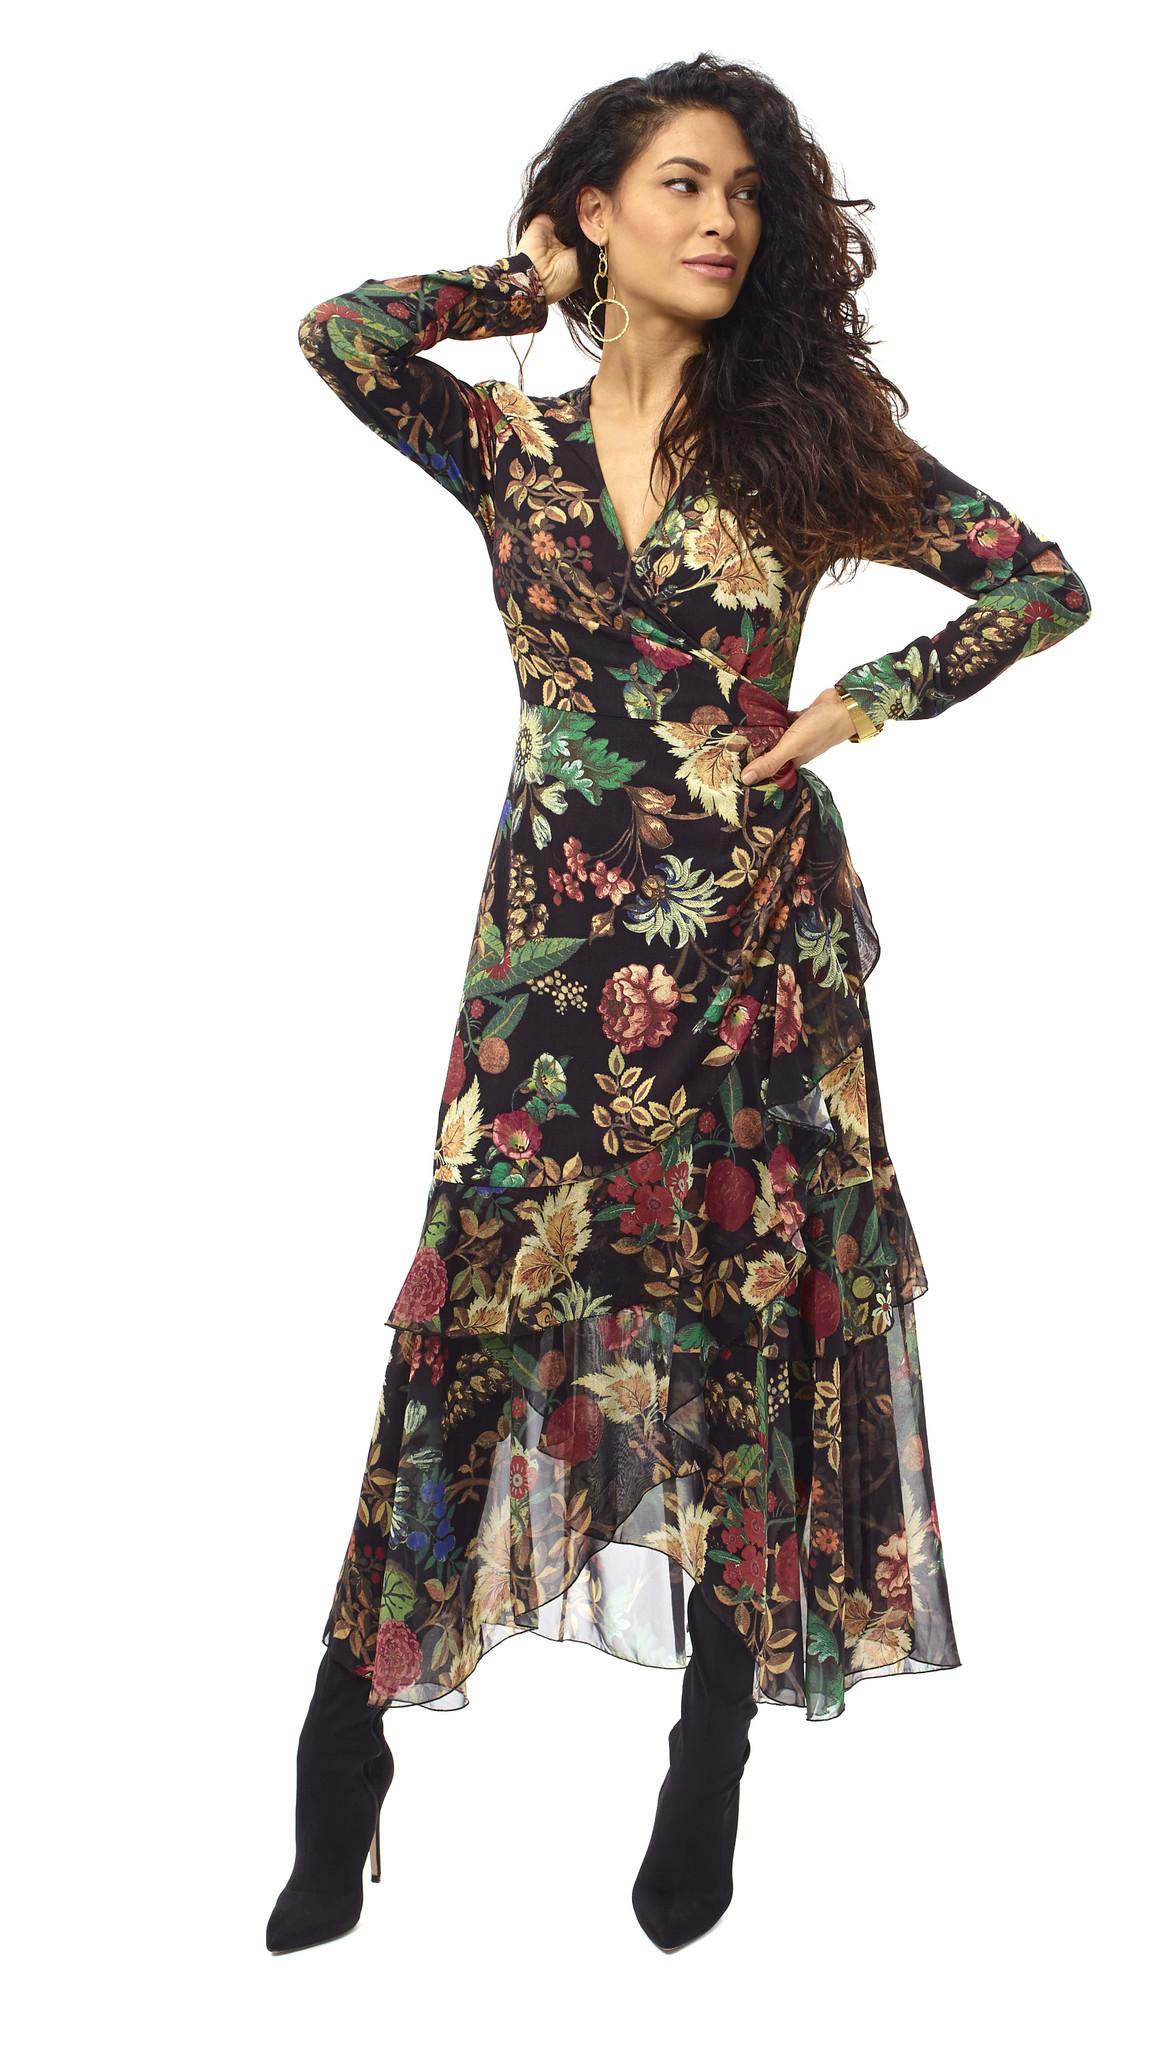 TESSA KOOPS INDIANA FORREST DRESS